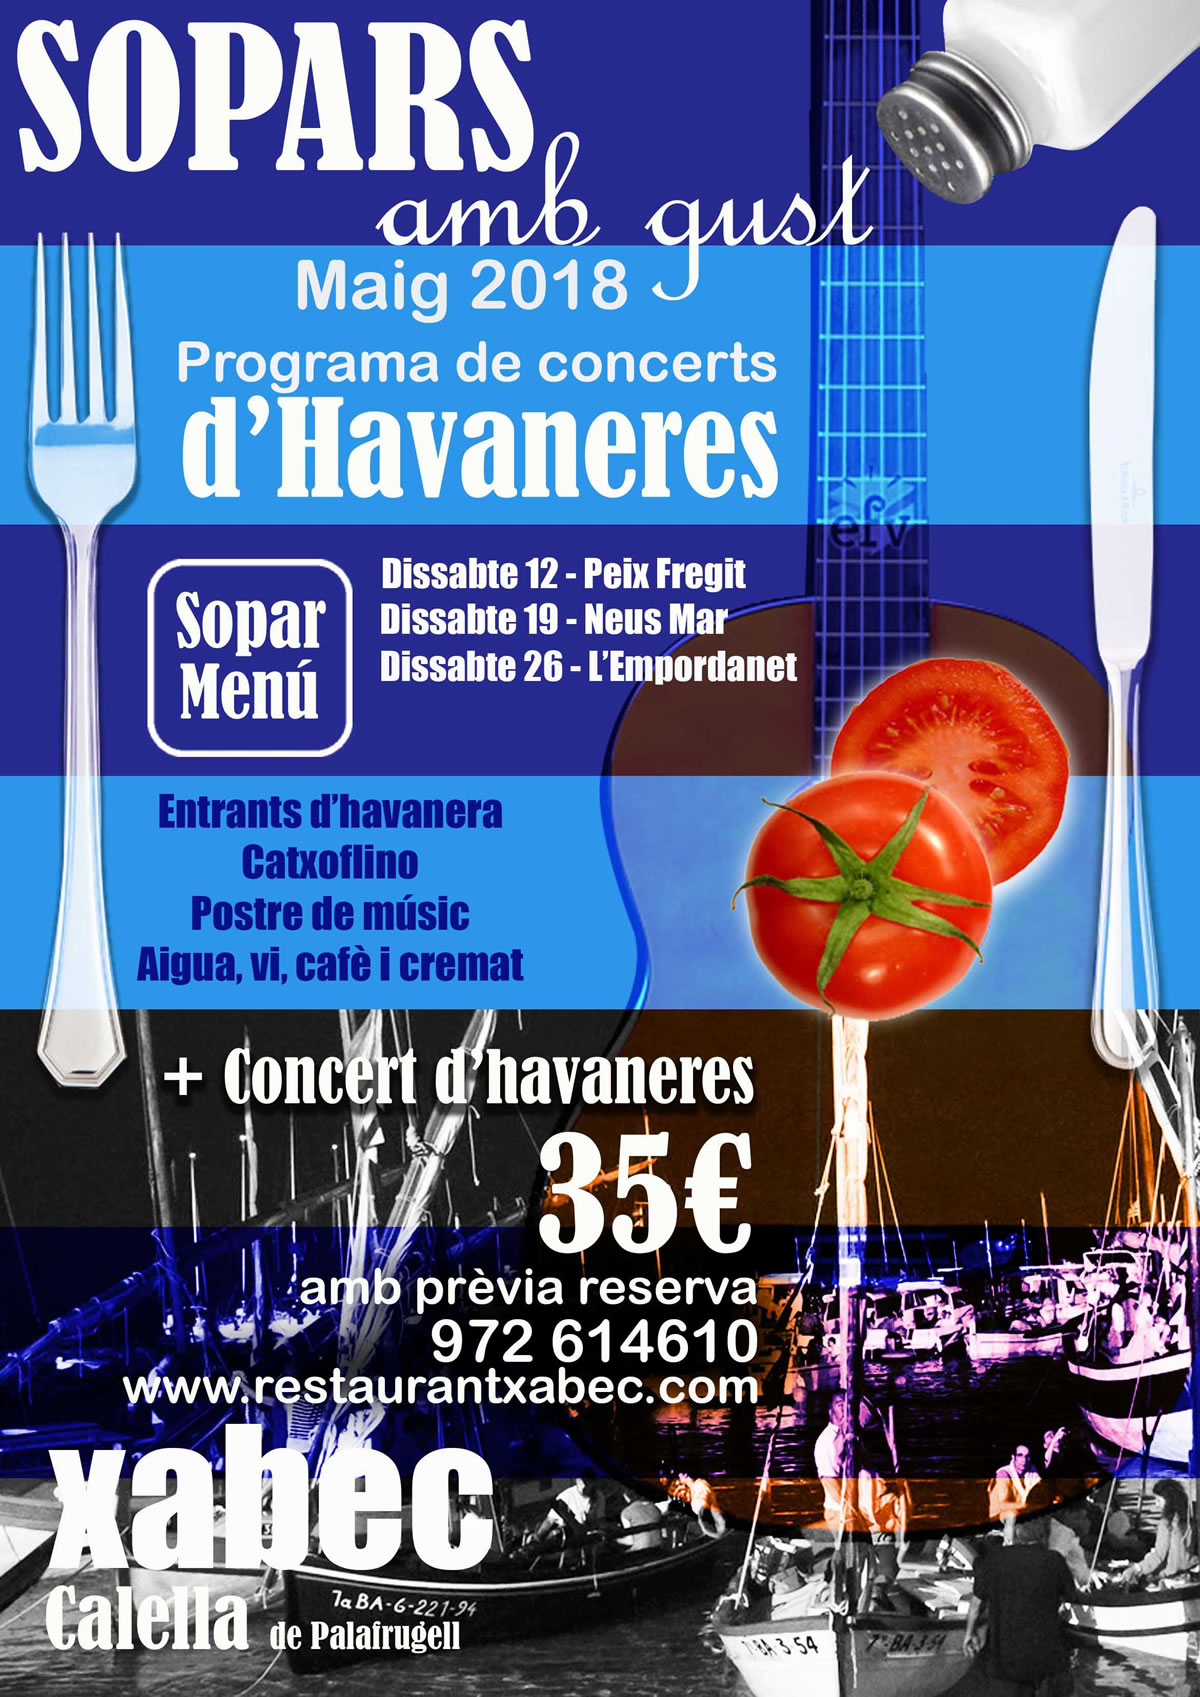 Sopars amb gust 2018 | Restaurant Xabec